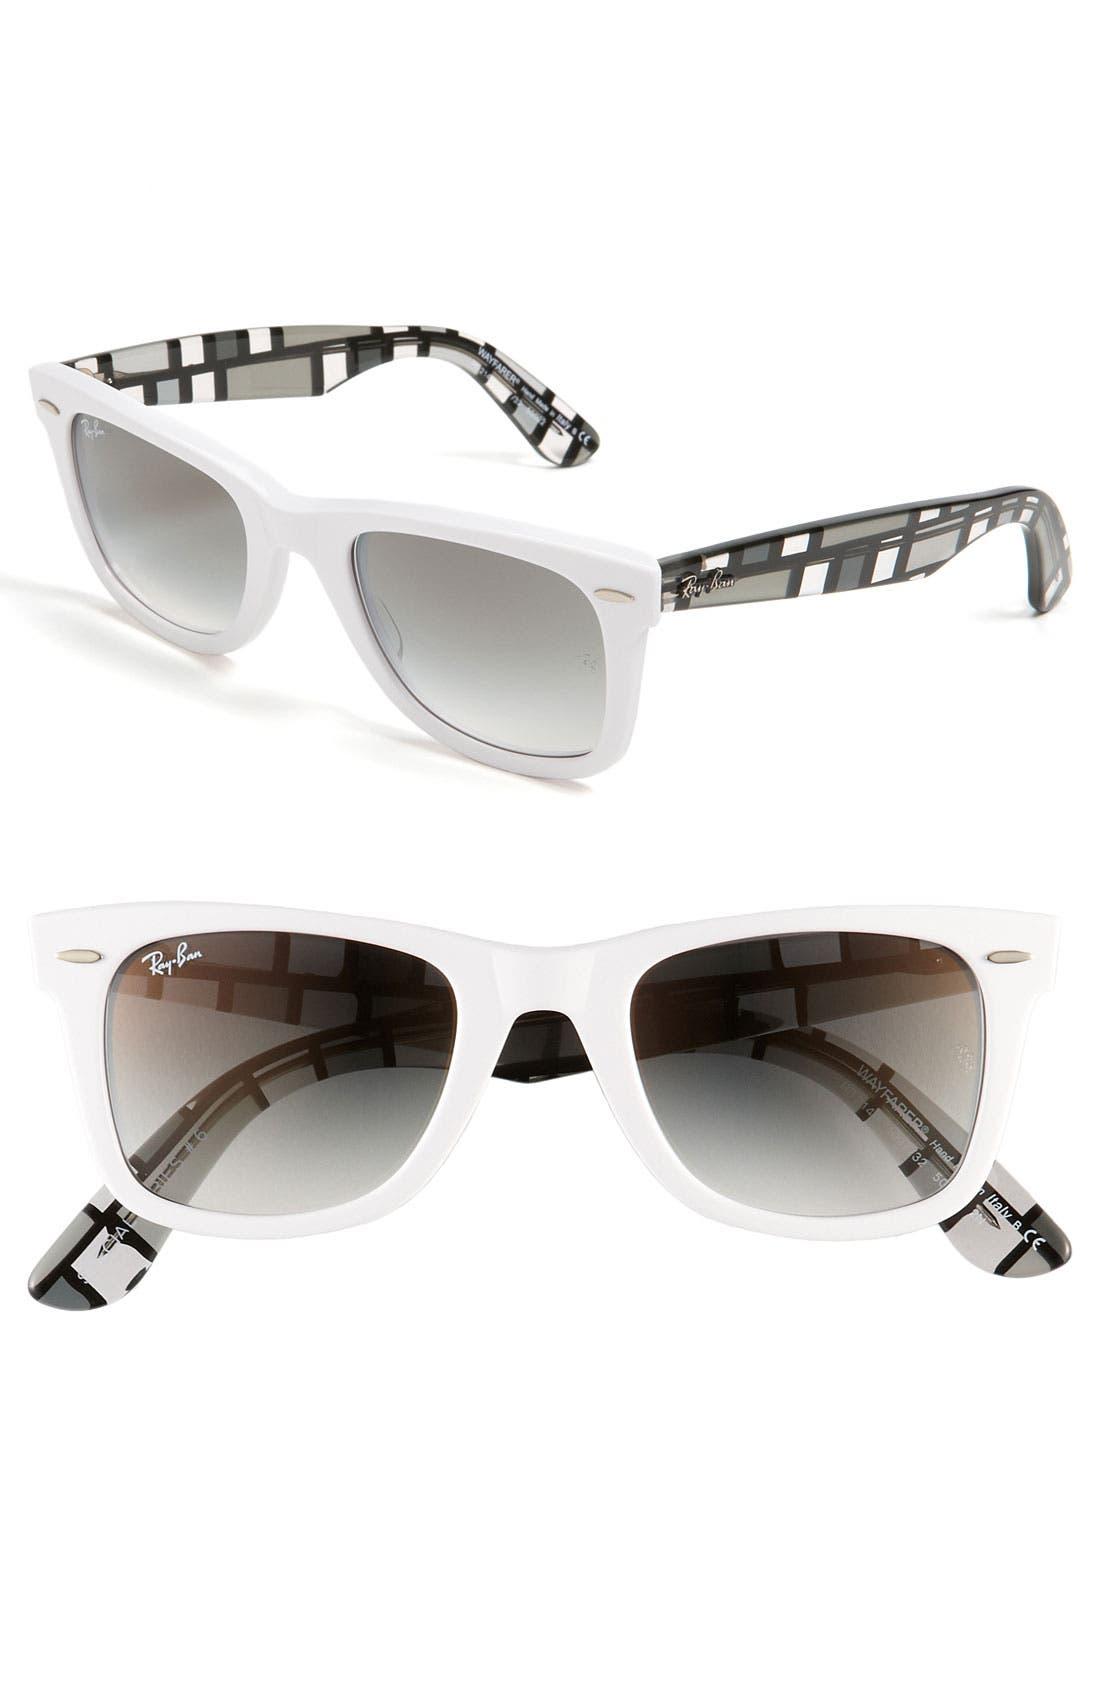 Main Image - Ray-Ban 'Classic Wayfarer' 50mm Sunglasses